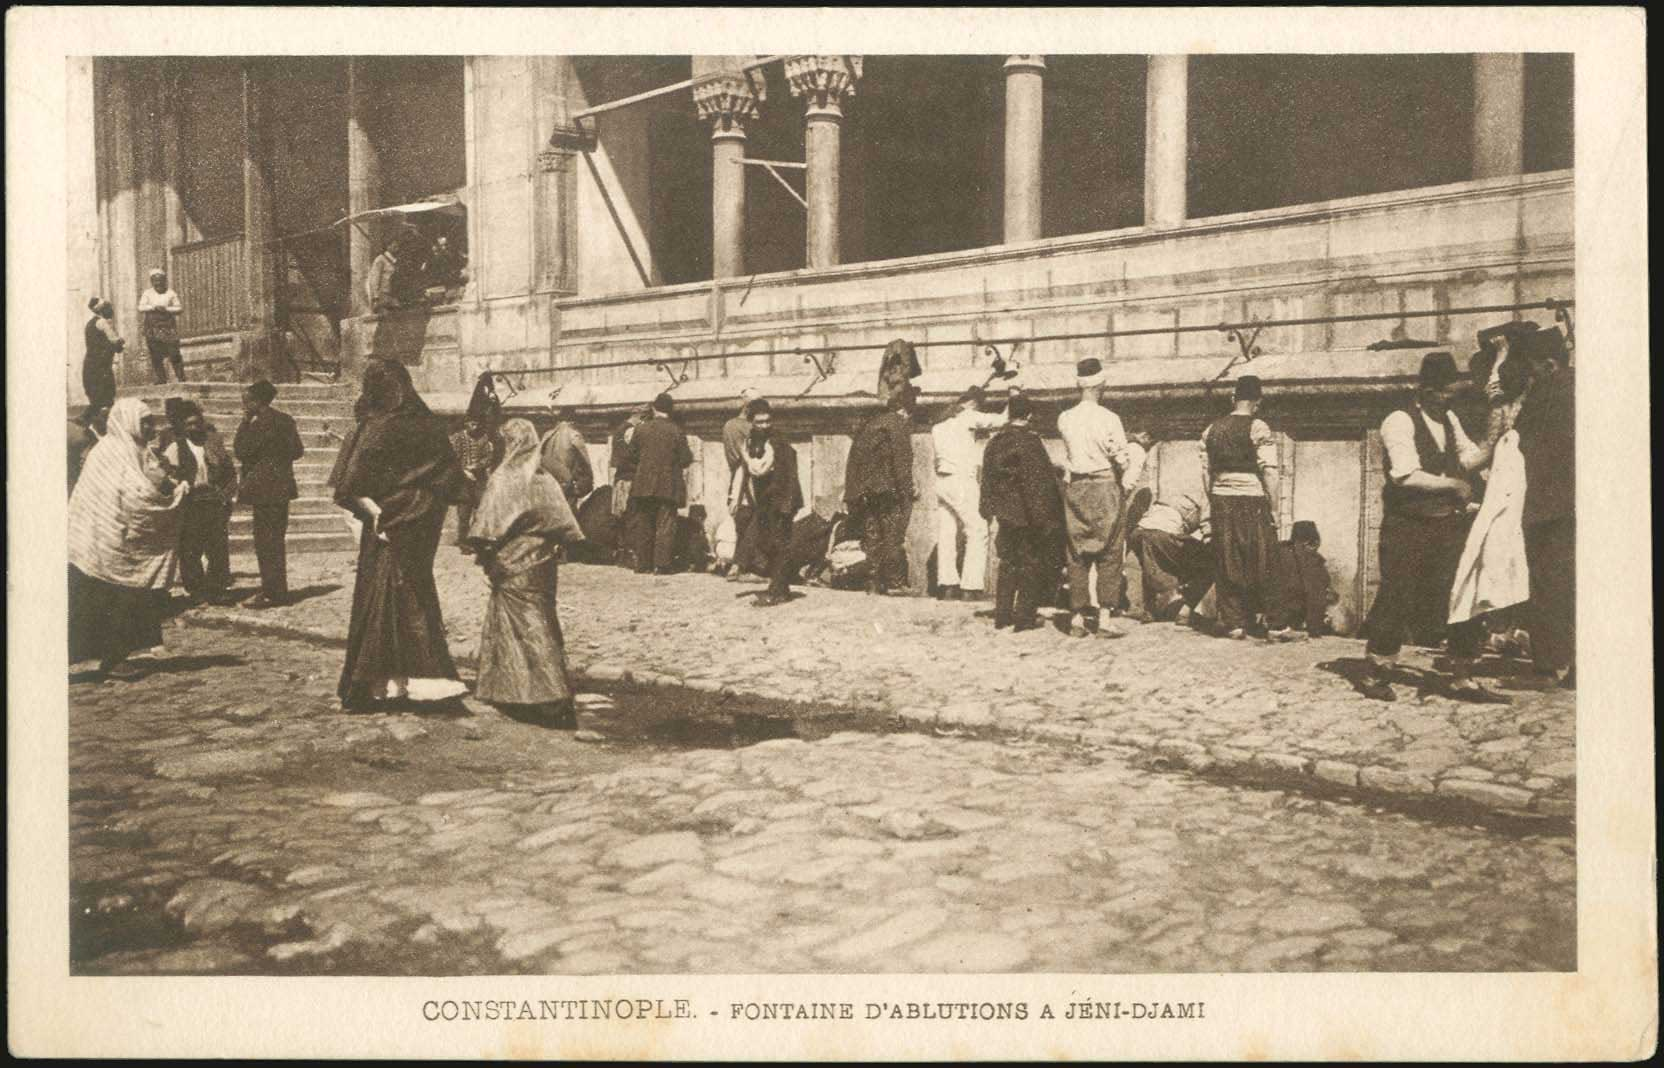 Lot 1755 - -  PICTURE POSTCARDS SMYRNE, CONSTANTINOPLE, ASIA MINOR -  A. Karamitsos Public & Live Internet Auction 675